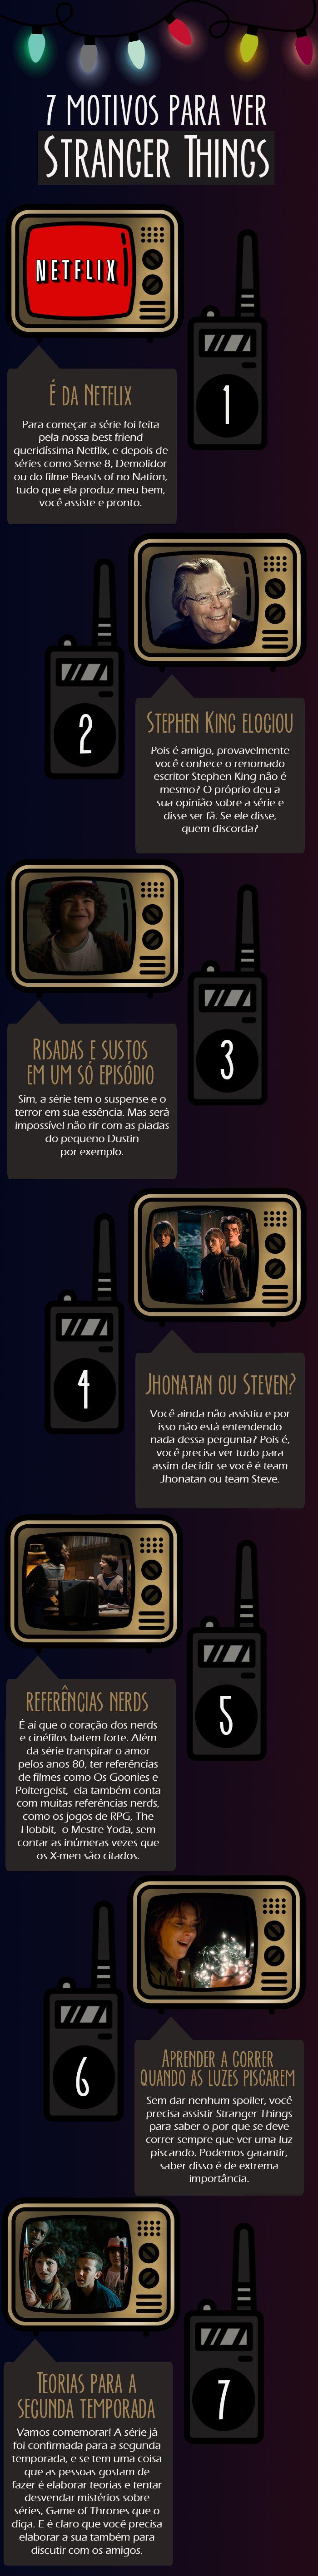 #SevenList #CabideColorido #Design #Infográfico #Art #TV #Series #Netflix #StrangerThings